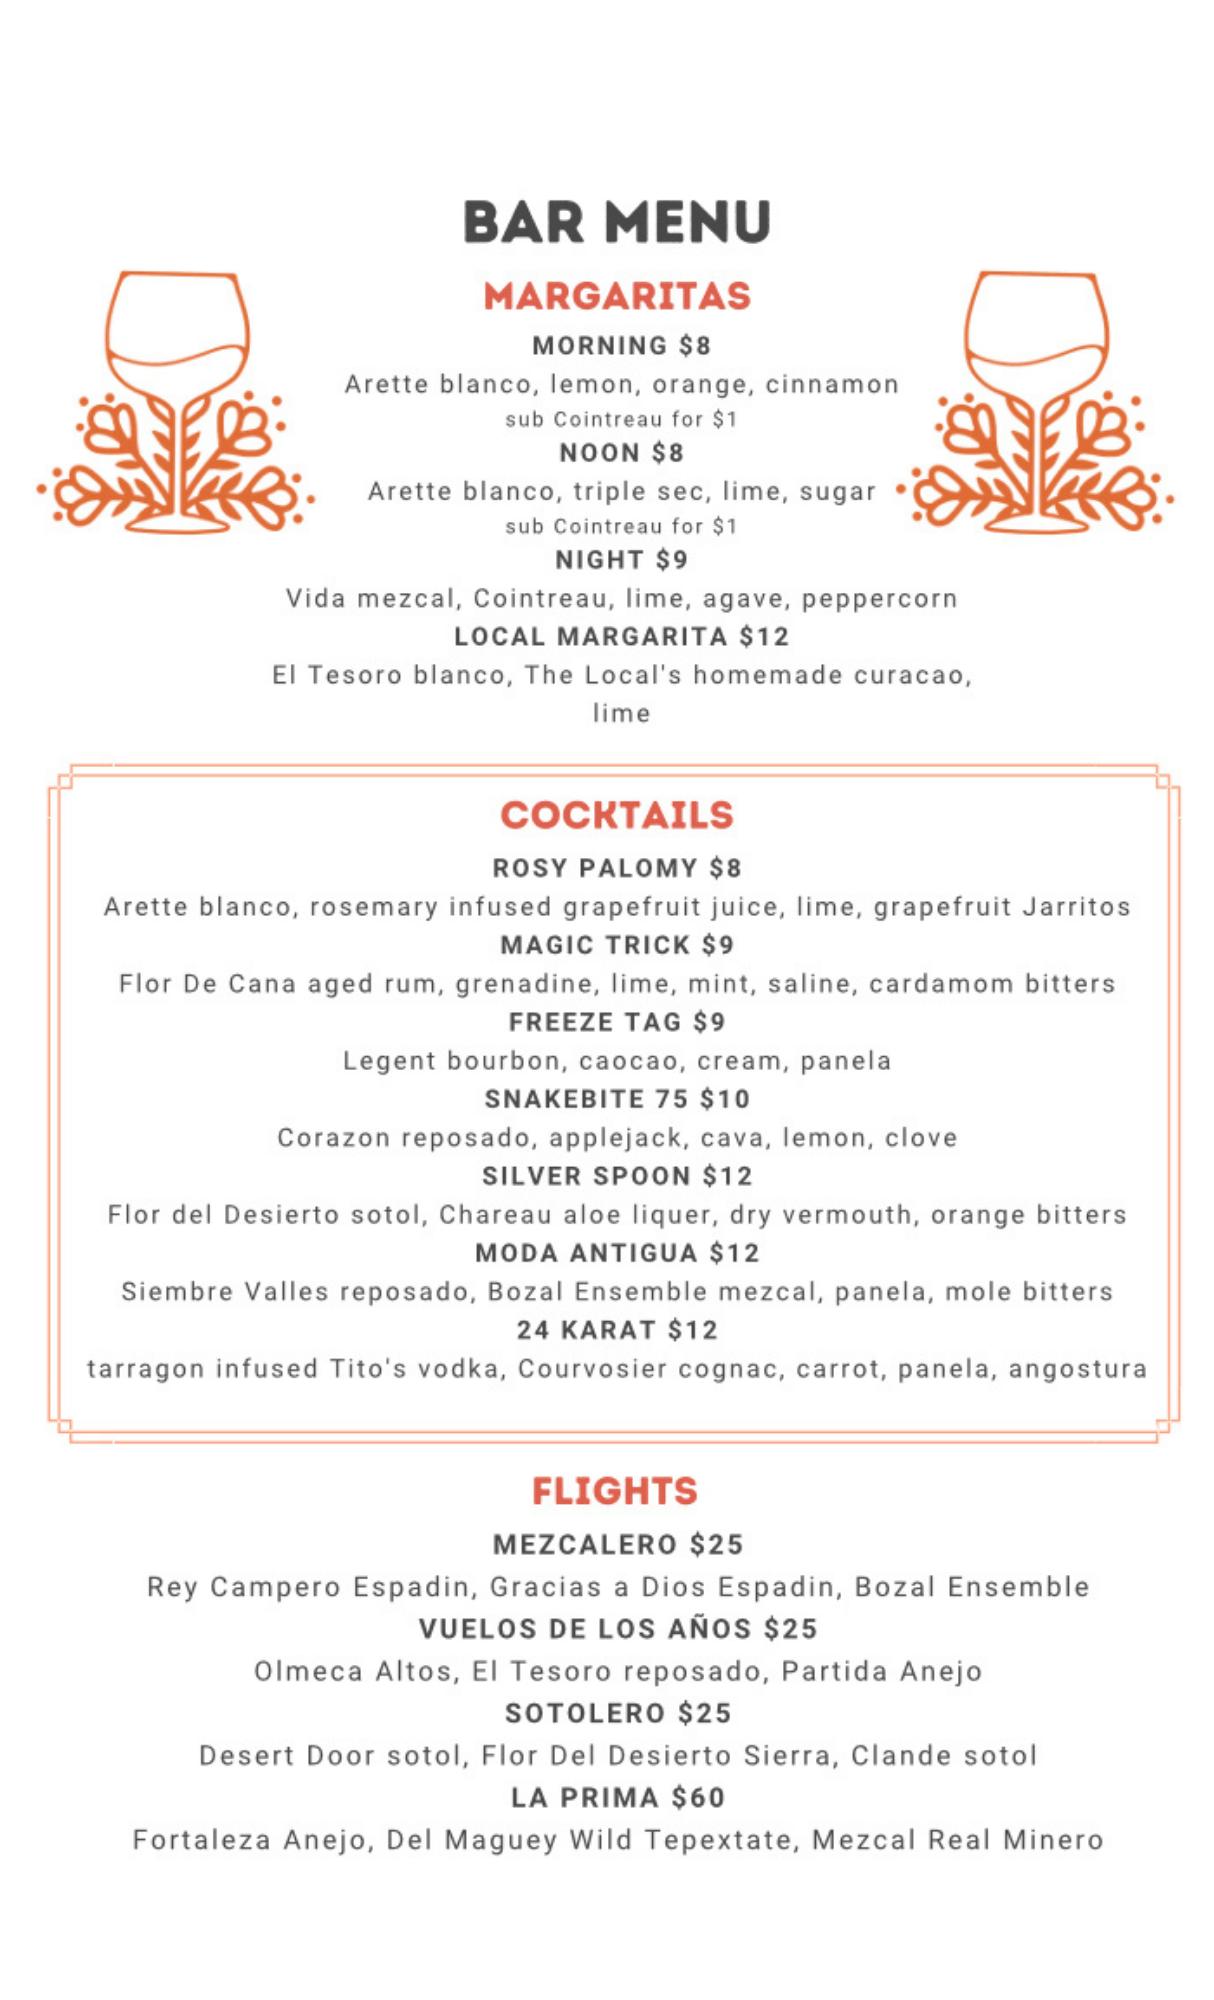 Front of bar menu